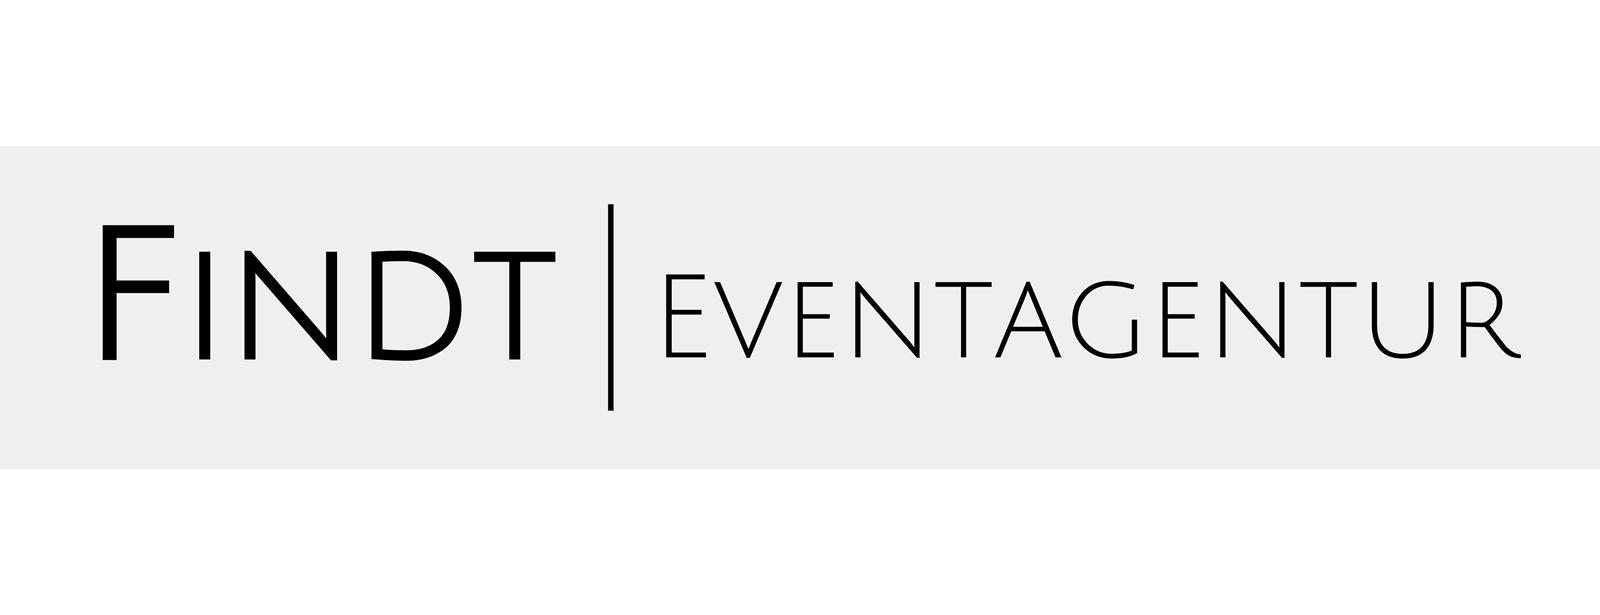 Eventagentur organizare